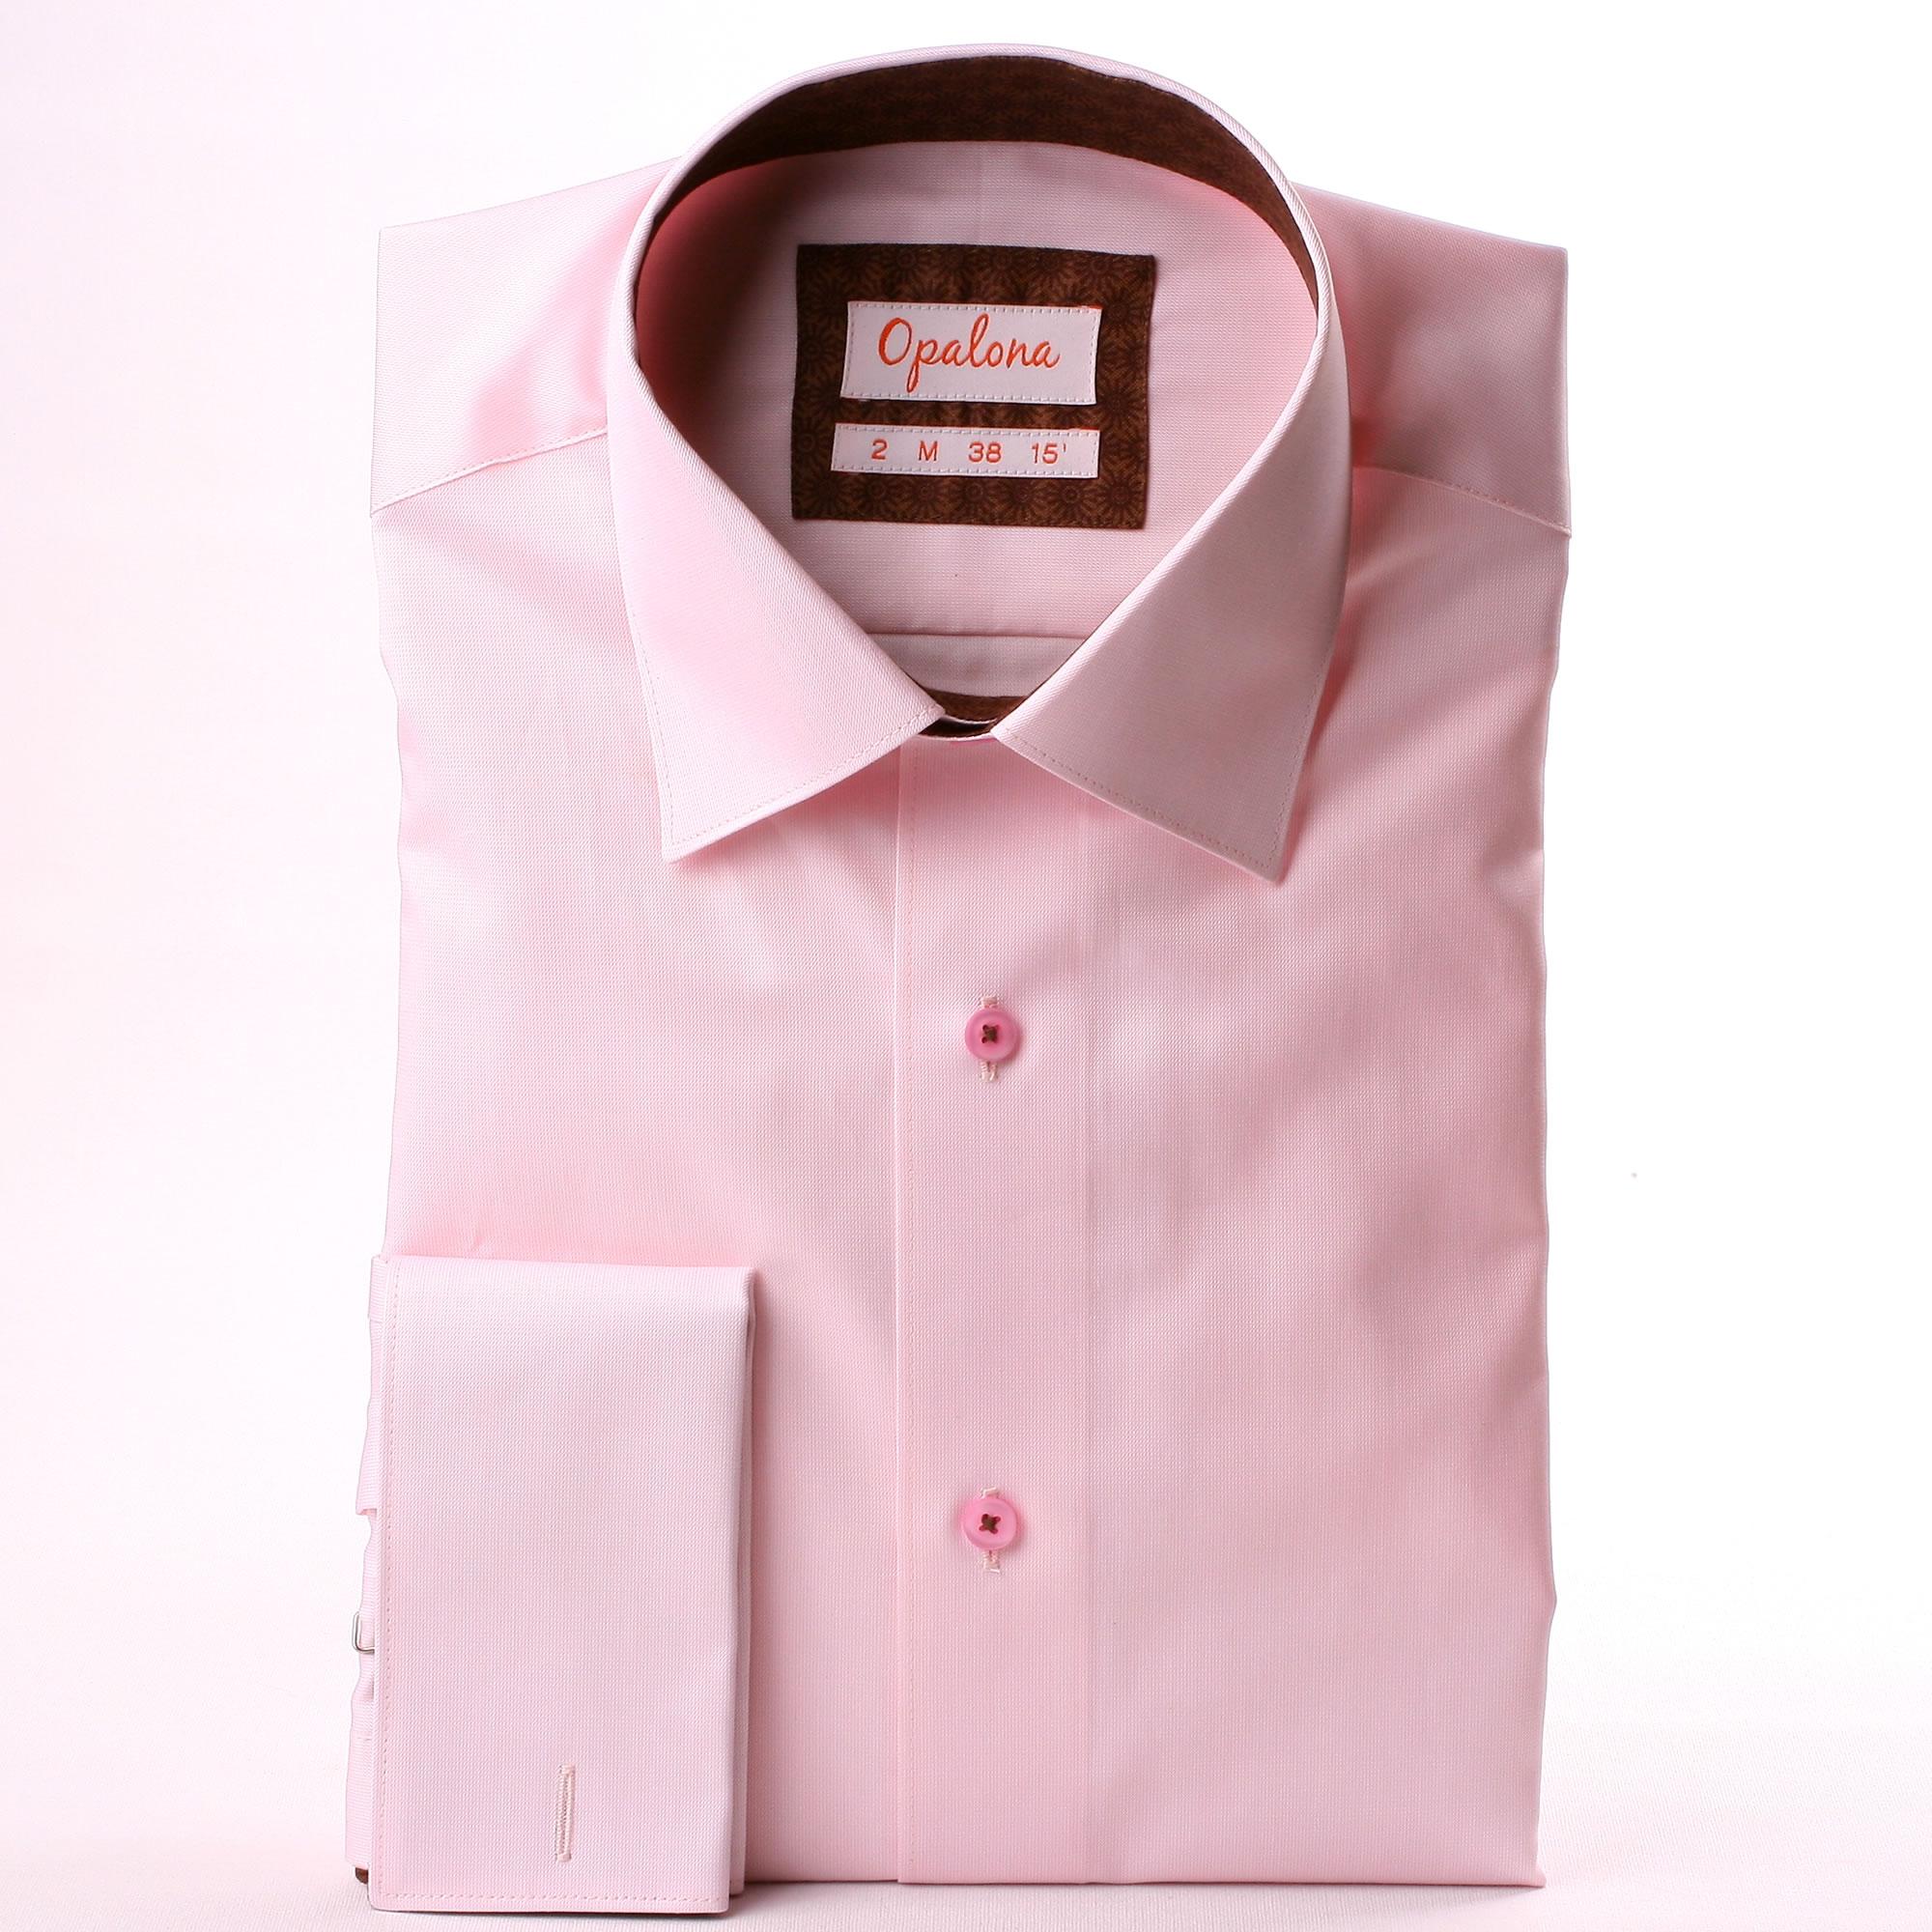 Pink french cuff shirt brown pattern collar and cuffs French cuff shirt women